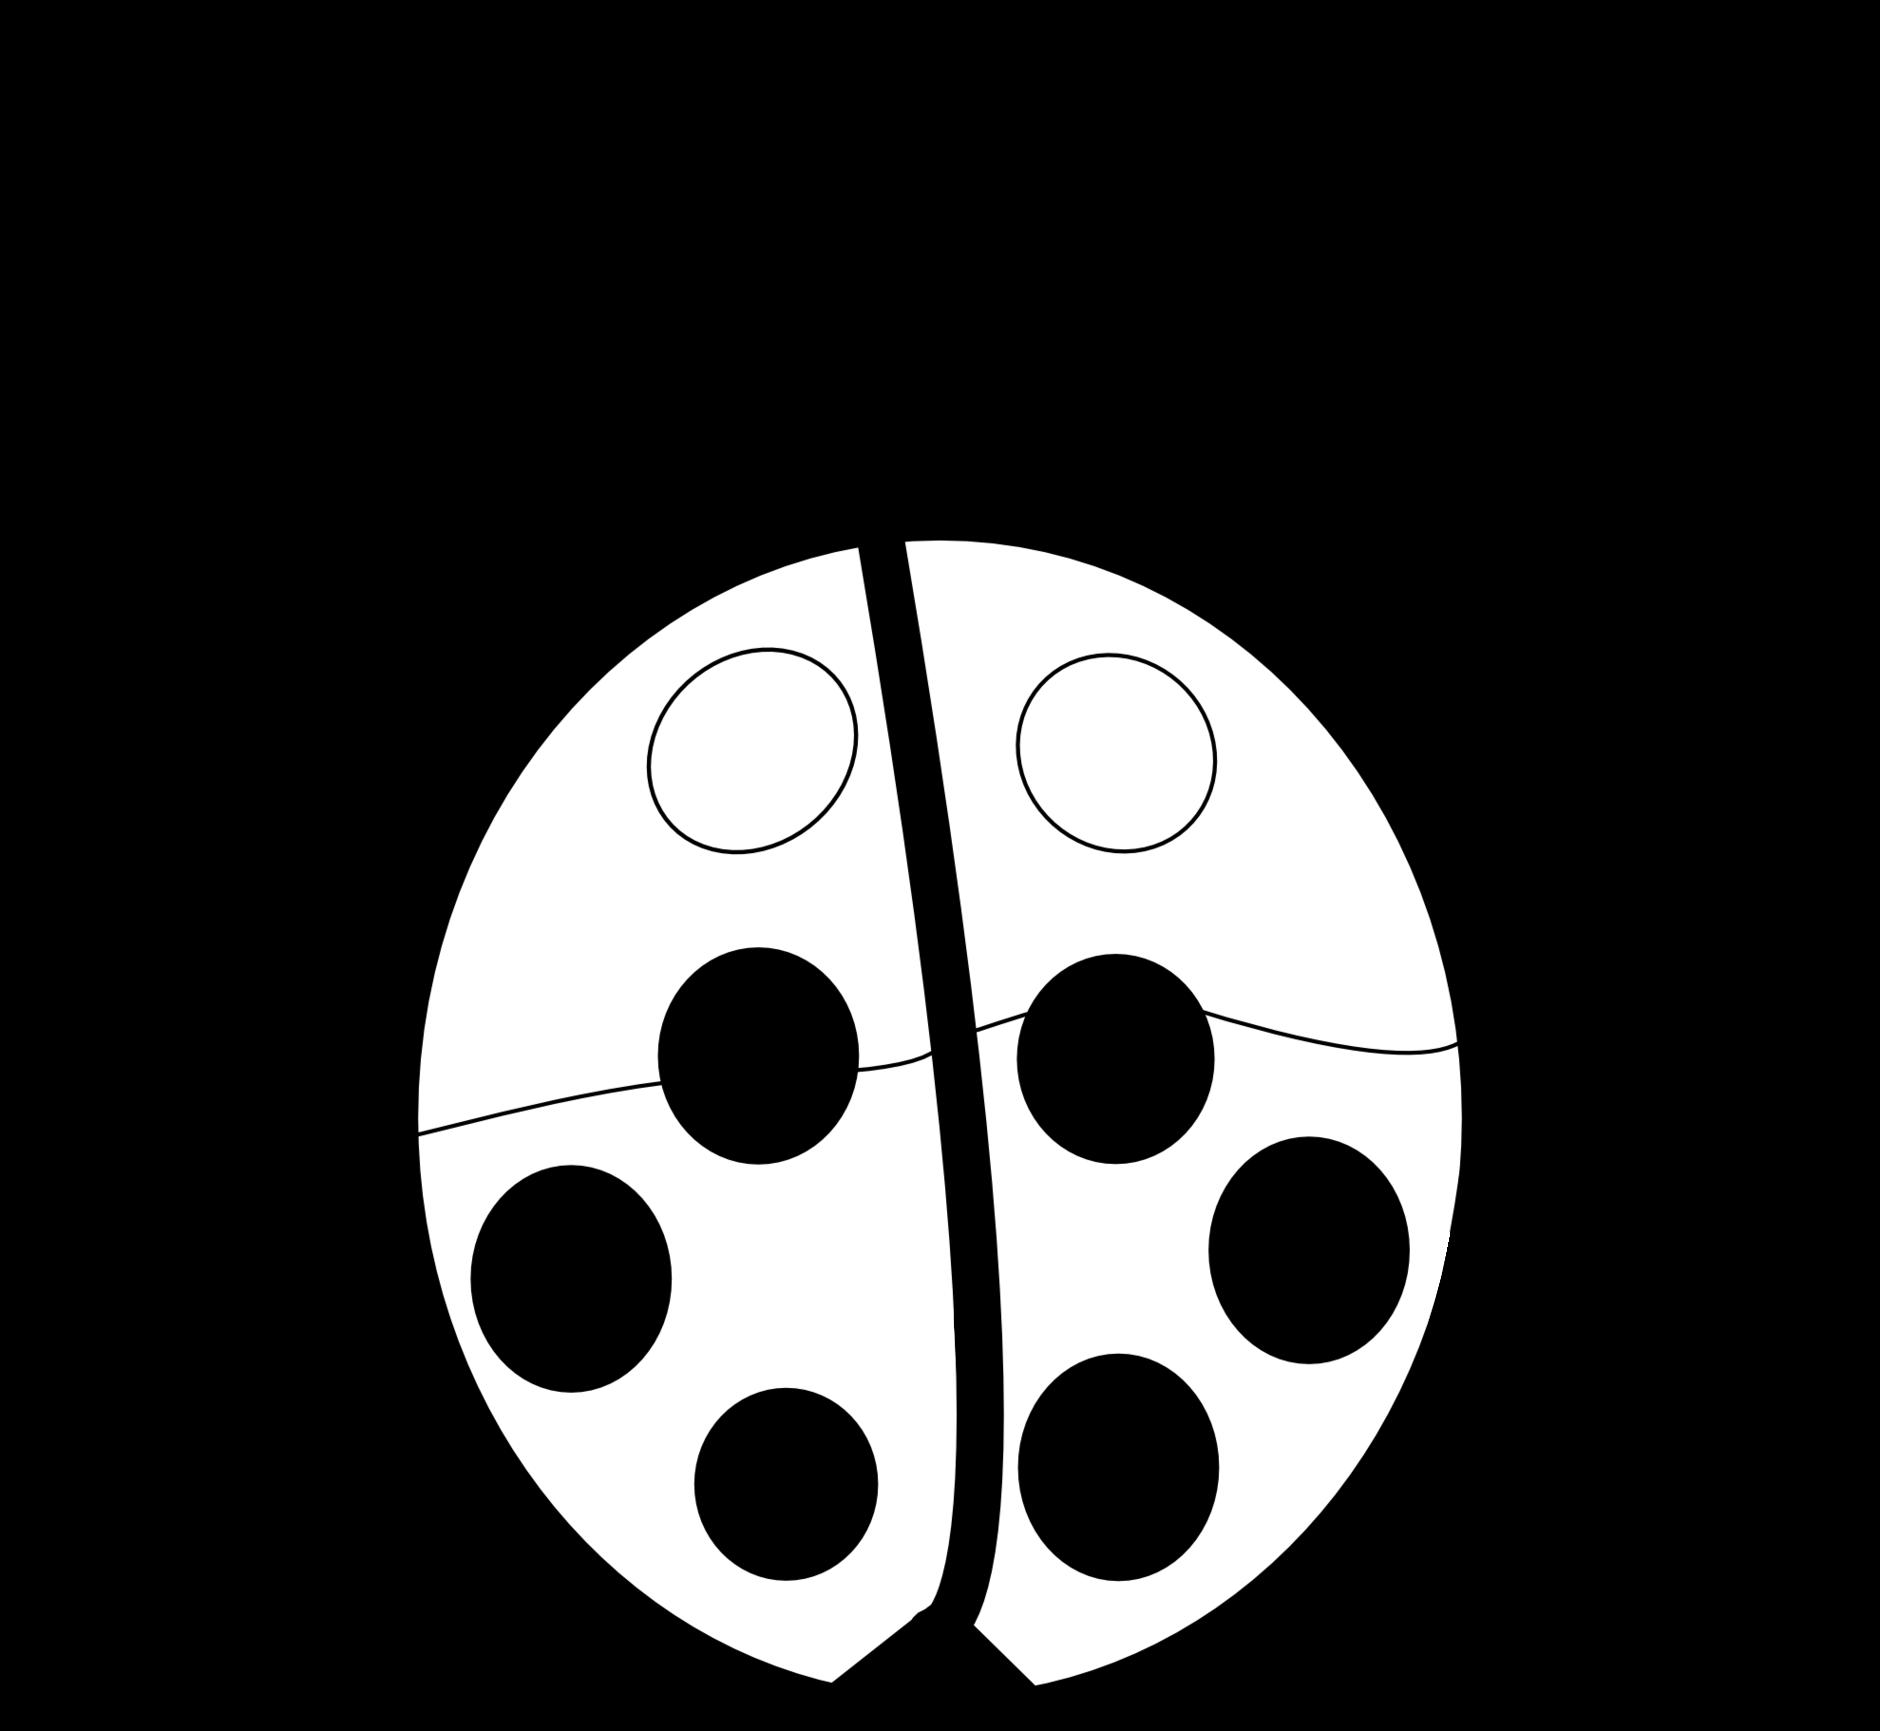 Free Bug Cliparts Black, Download Free Clip Art, Free Clip.